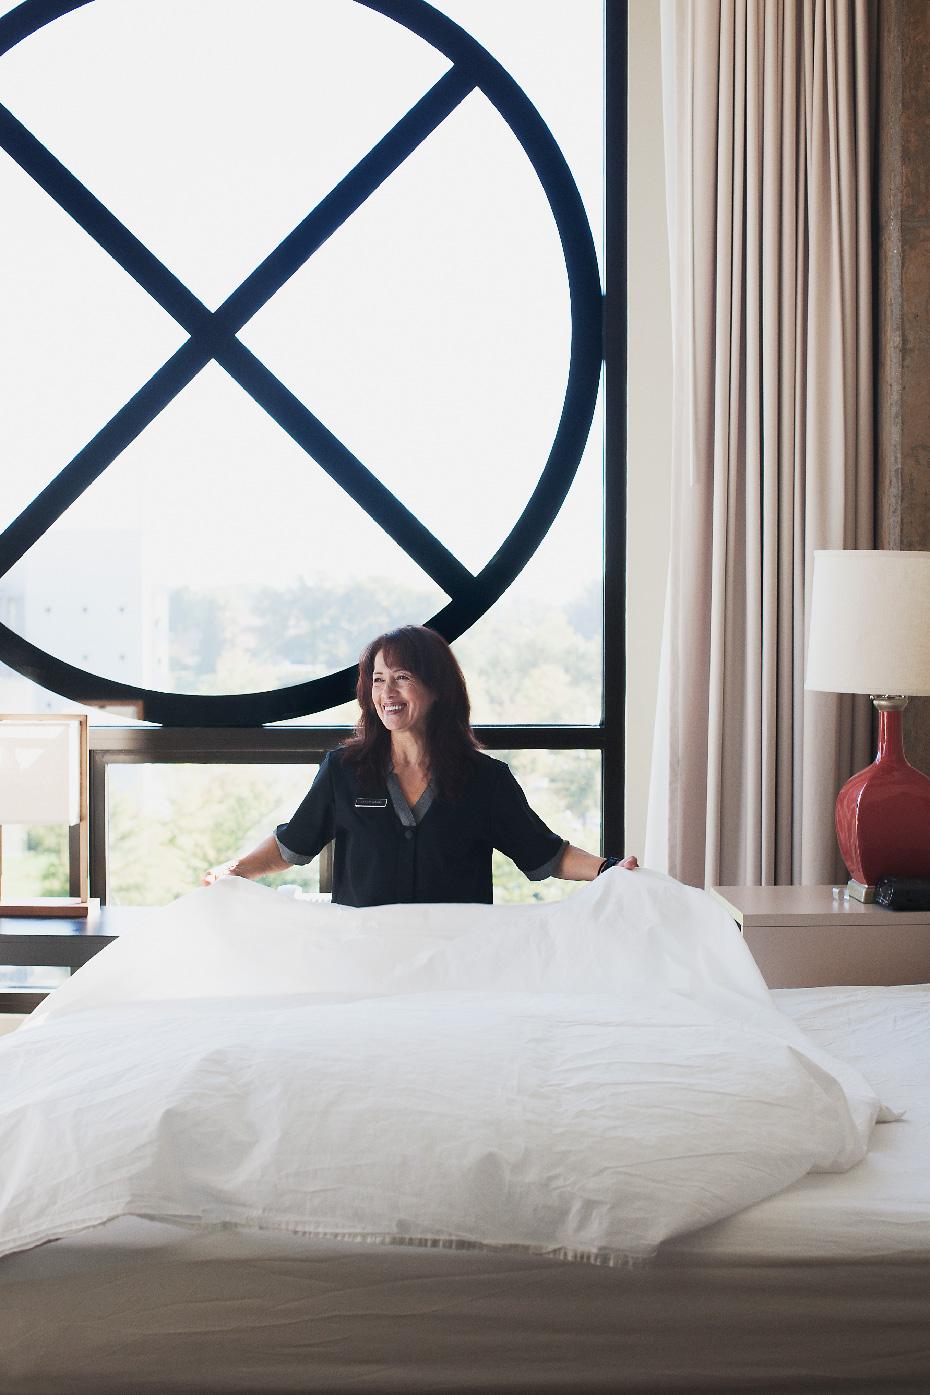 Stacey Van Berkel Photography I Maid making bed at beautiful Proximity Hotel I Greensboro, North Carolina